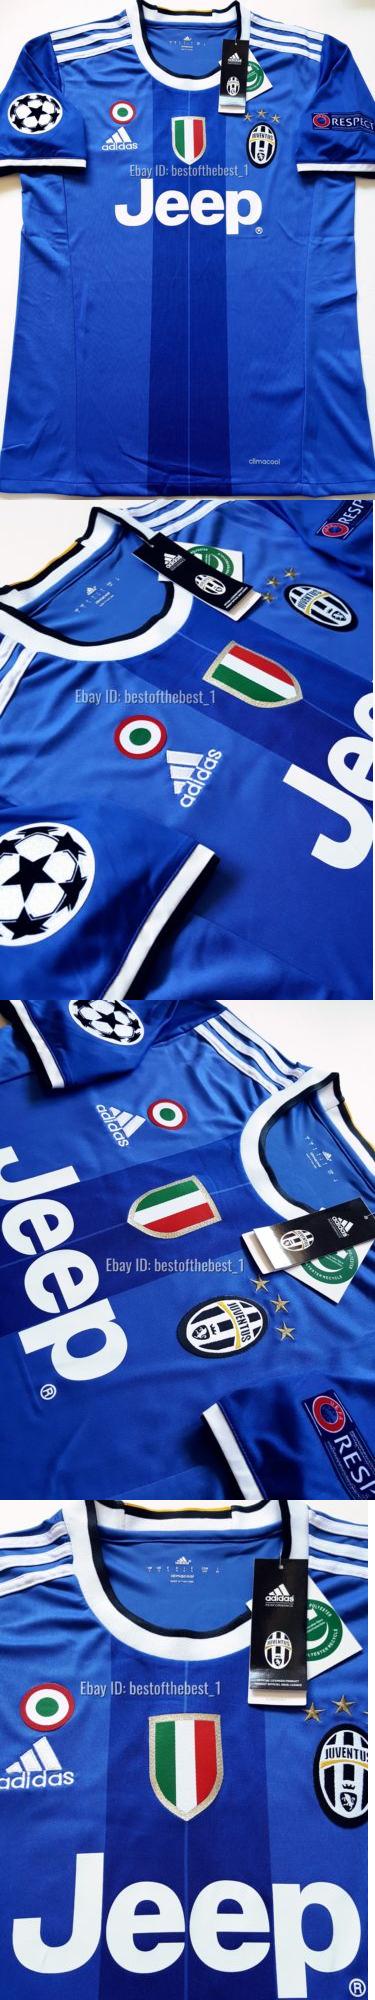 ... NWT Soccer-International Clubs 2887 2016 2017 Juventus Champions League  Paulo Dybala Away Jersey Blue . e686cf924